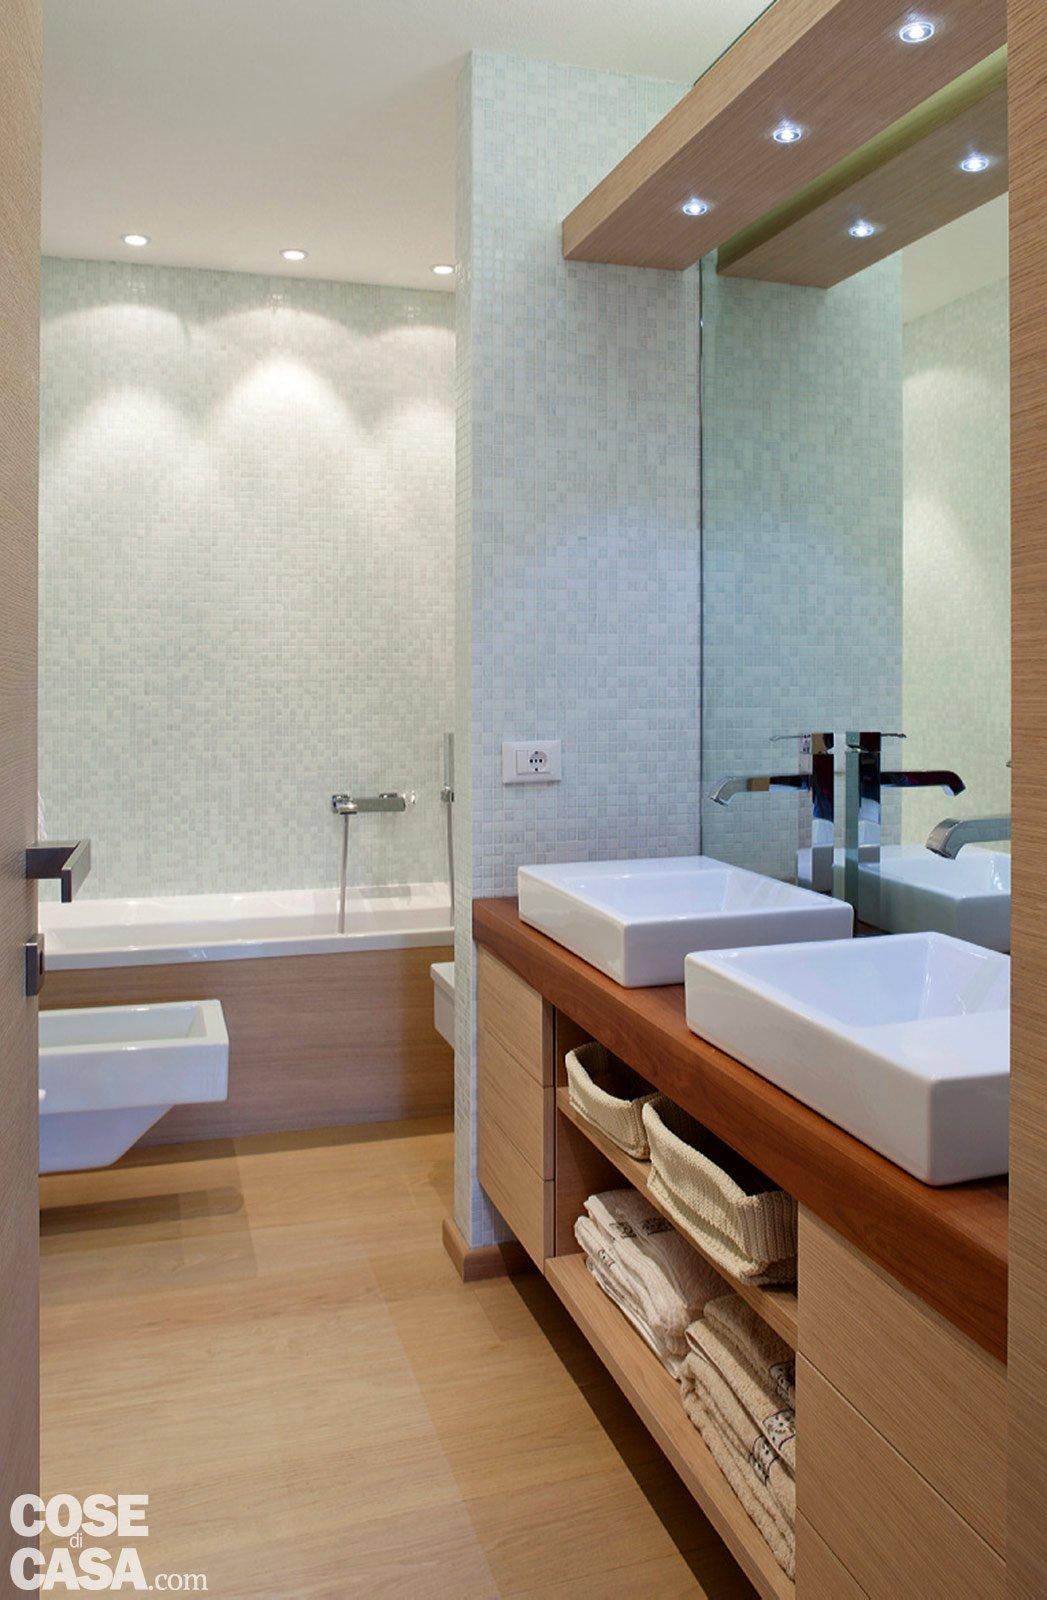 Beautiful Bagno 6 Mq Ideas - Idee Arredamento Casa - adrianne ...